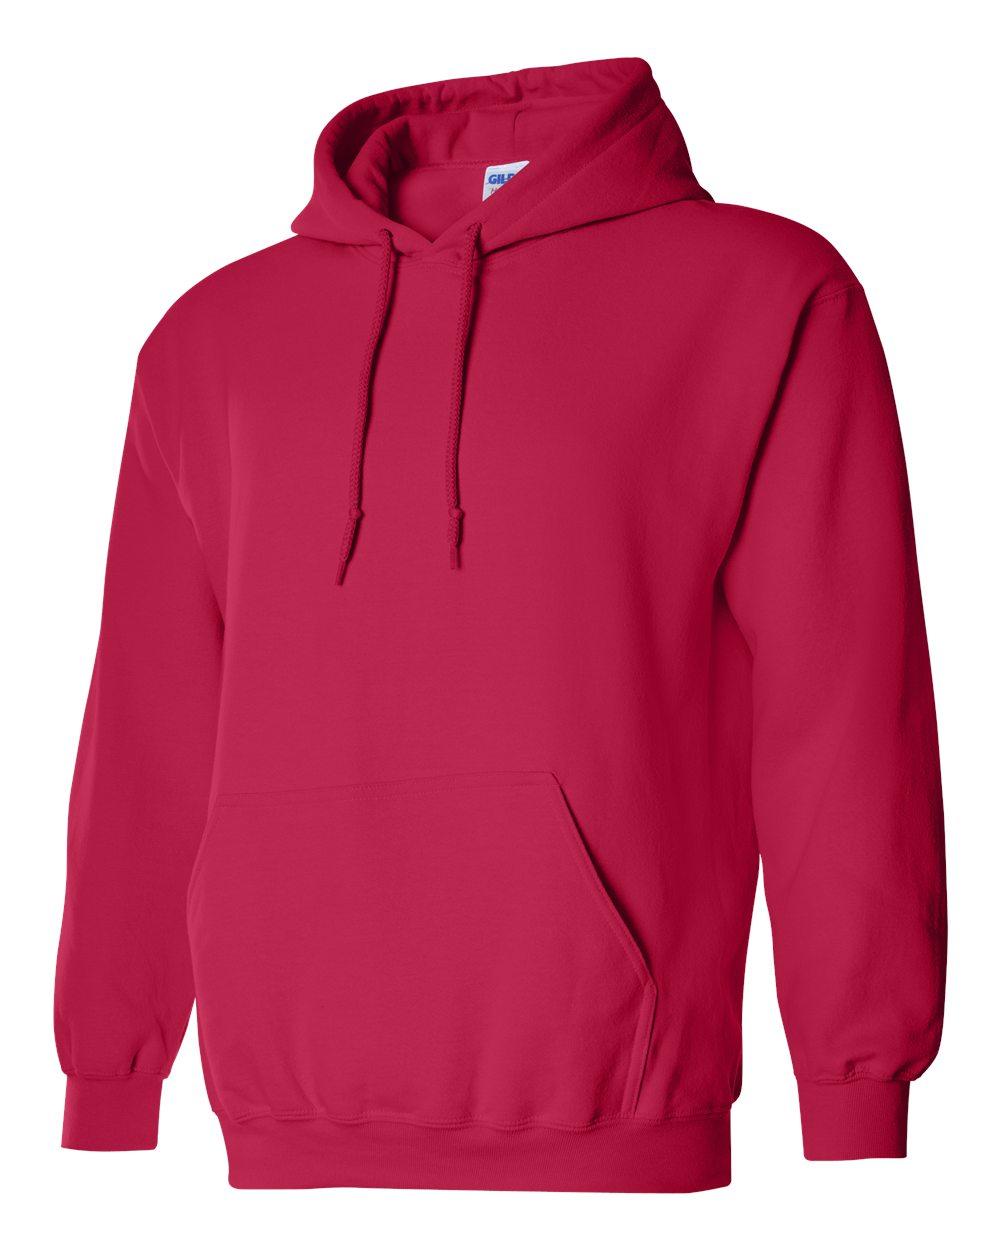 Gildan Heavy Blend Hooded Sweatshirt GI18500 Cherry Red